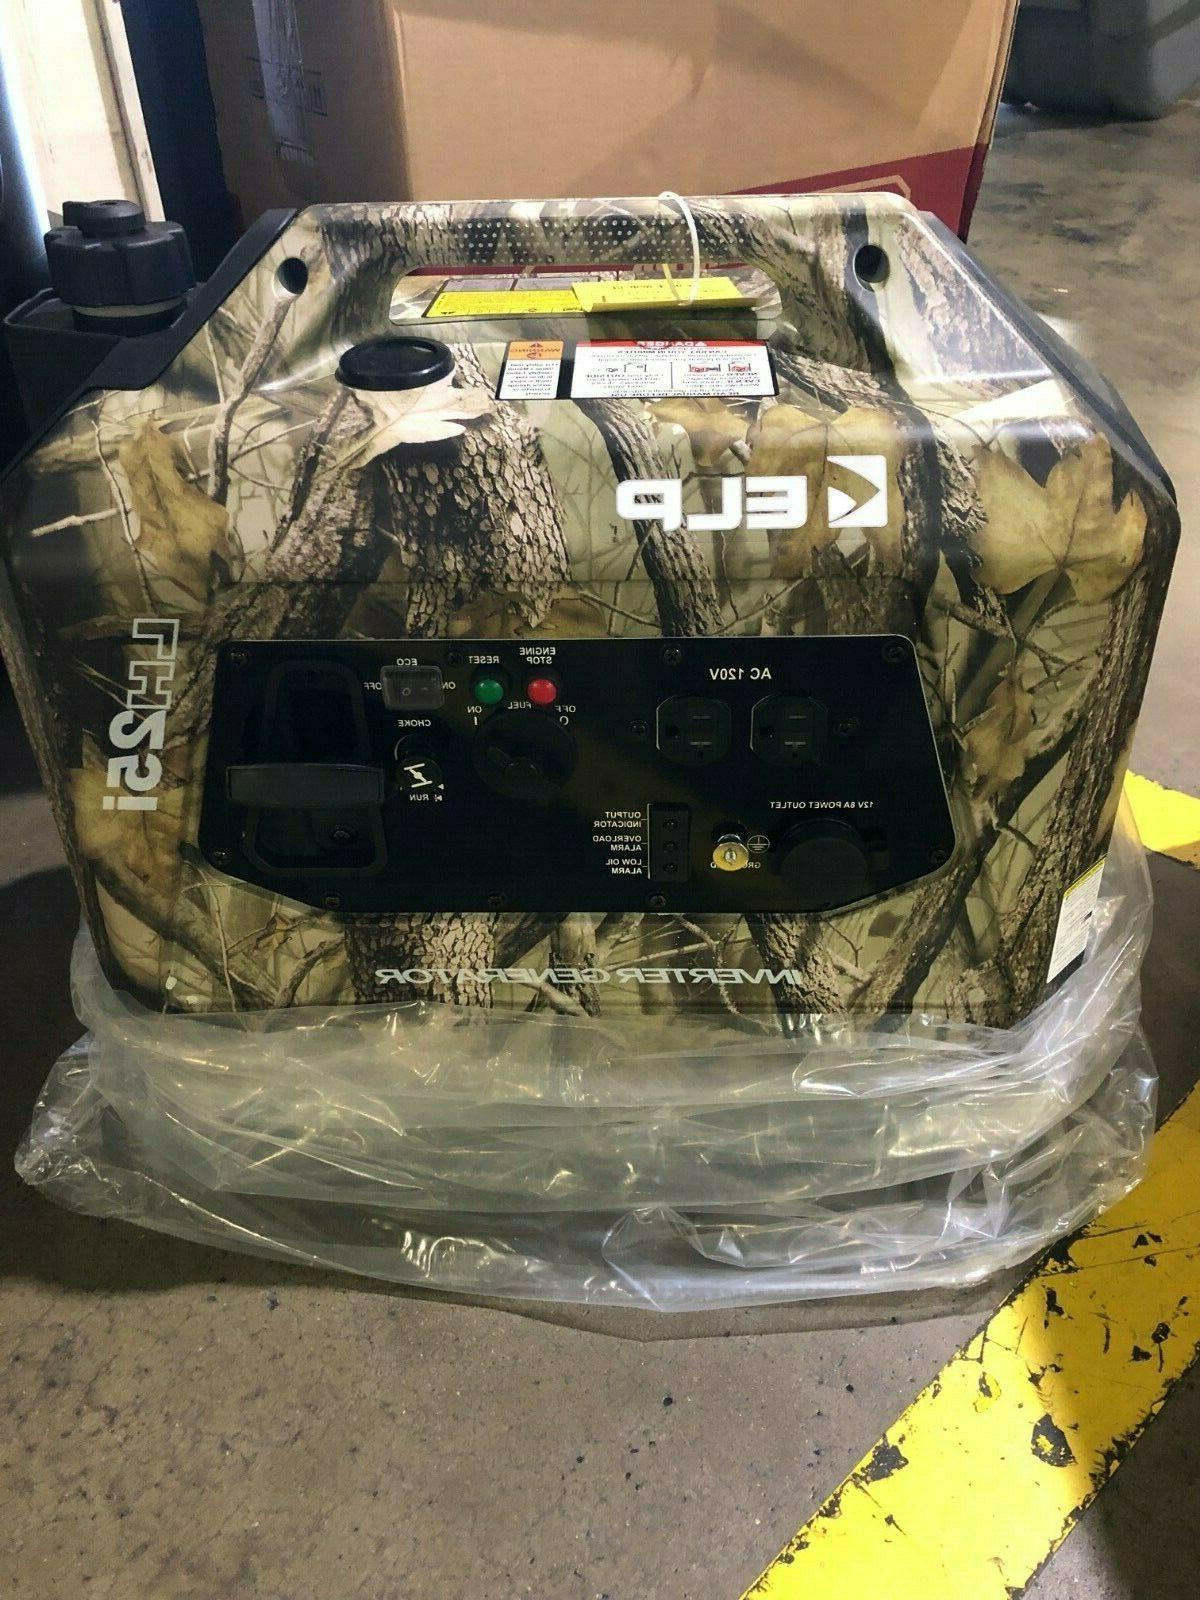 2500 watt inverter generator works better than